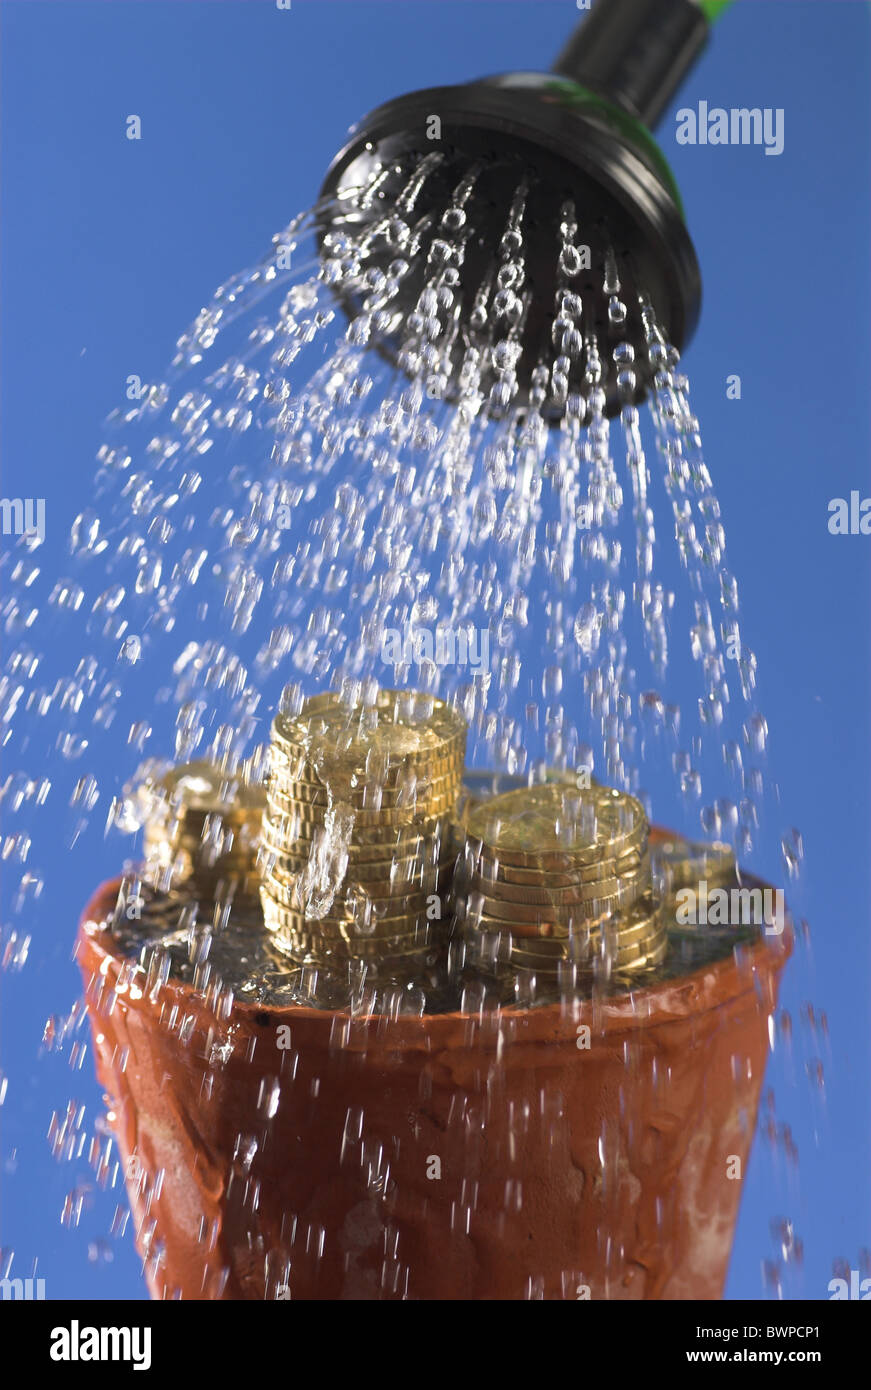 Símbolo de blanqueo de dinero concepto maceta Monedas Monedas Moneda Finanzas rociadores ducha ducha de agua Imagen De Stock